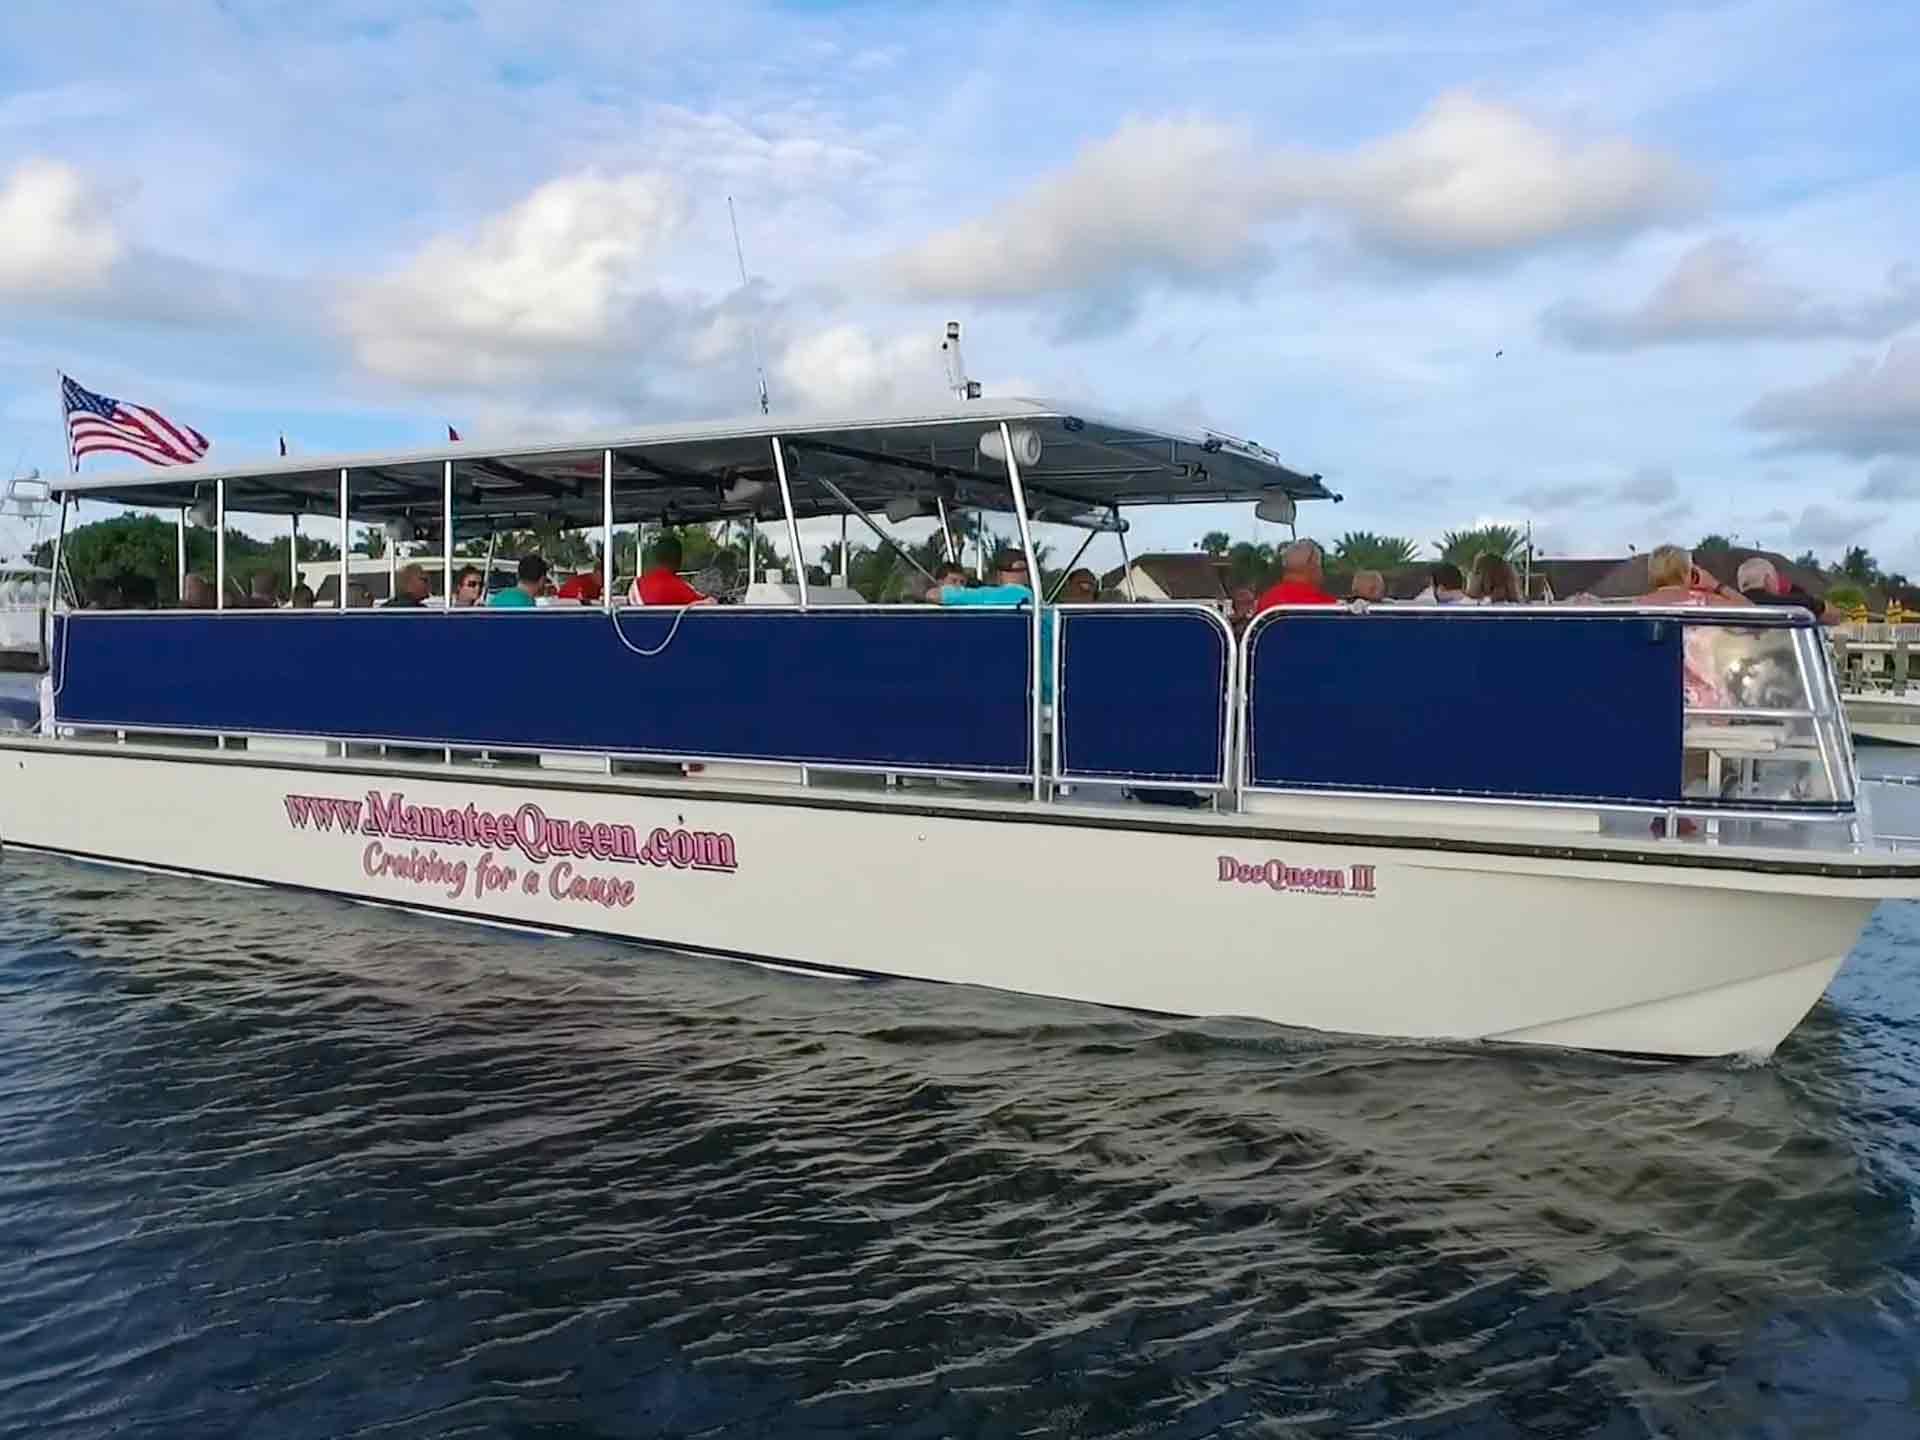 Dee Queen II catamaran on a cruise